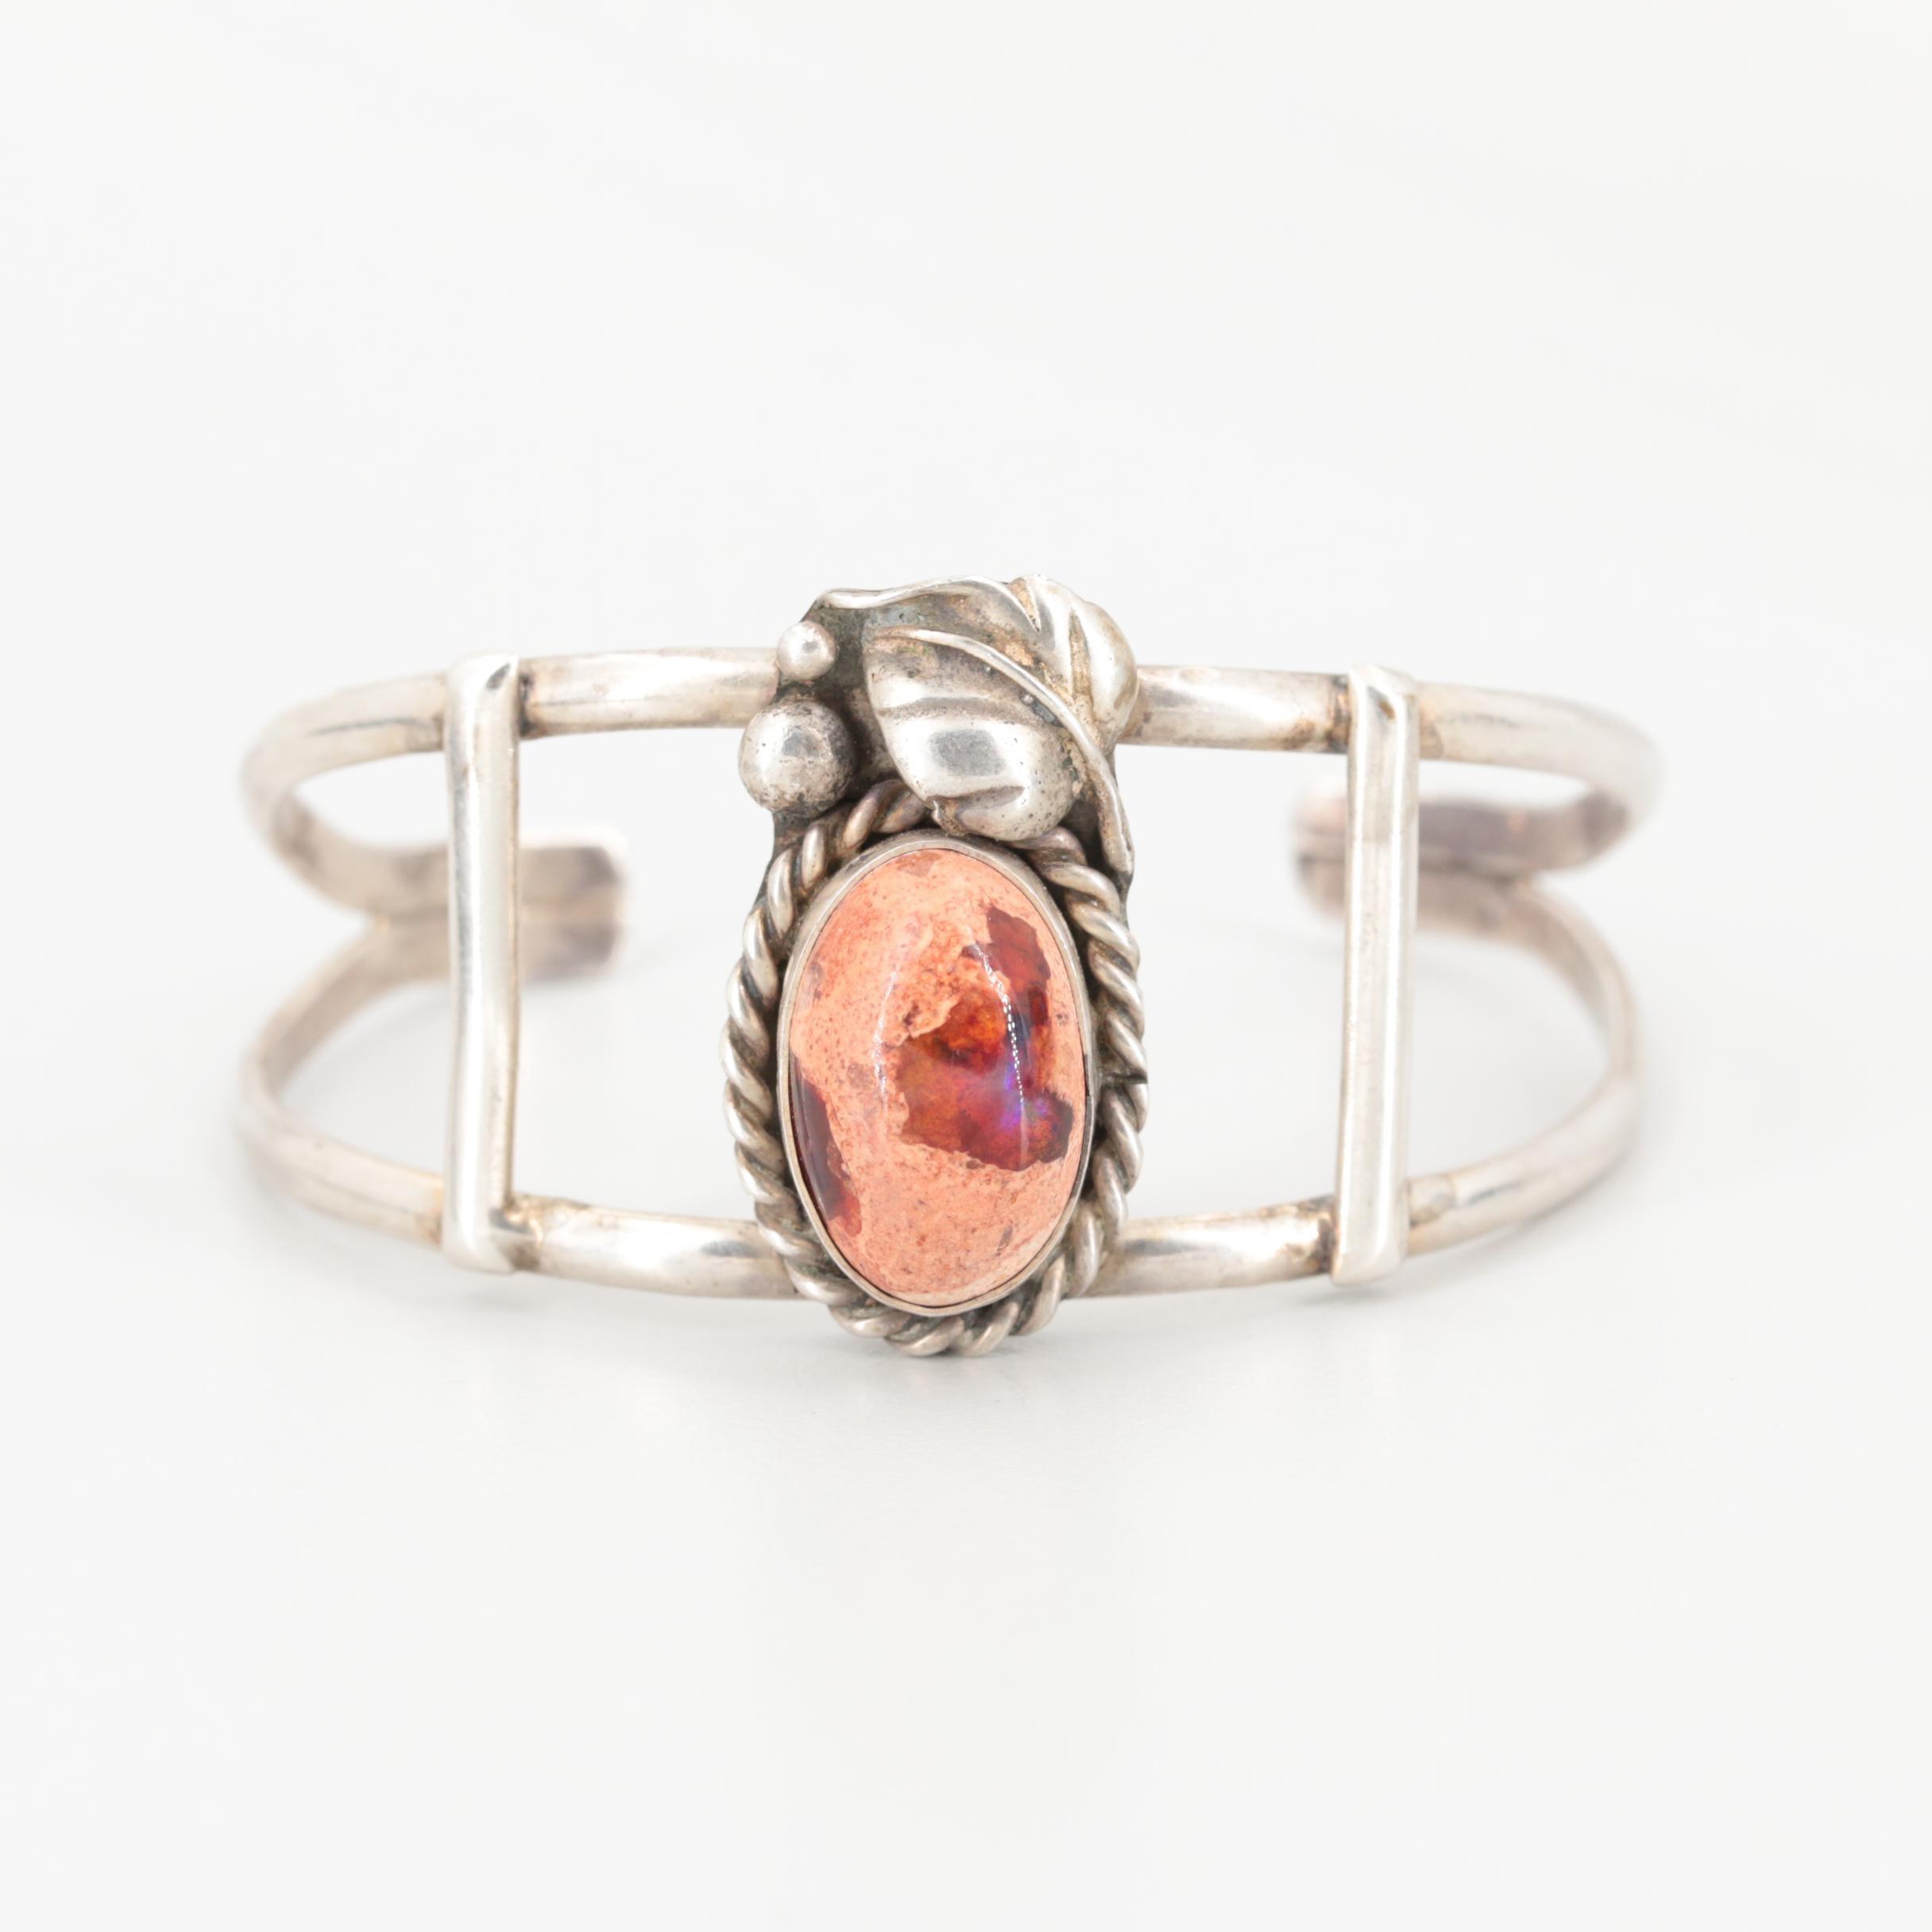 Southwestern Style Sterling Silver Boulder Opal Cuff Bracelet